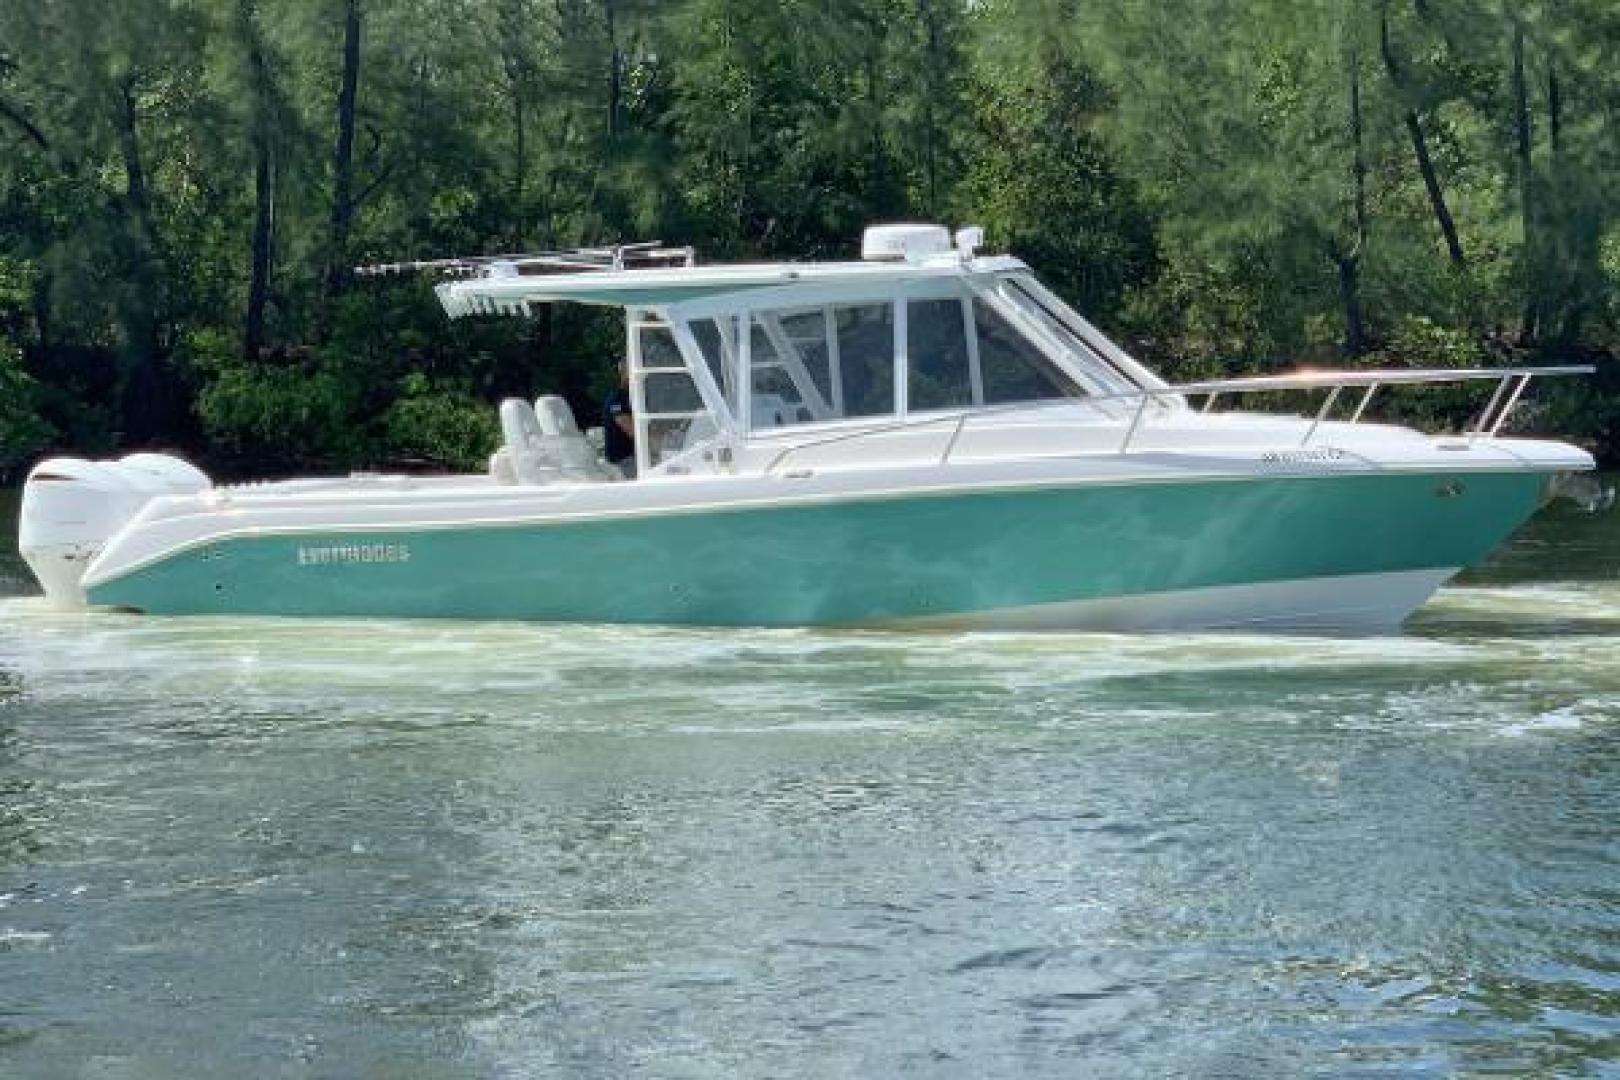 Everglades-350LX 2016-Everglades 350LX Fort Lauderdale-Florida-United States-1530946 | Thumbnail